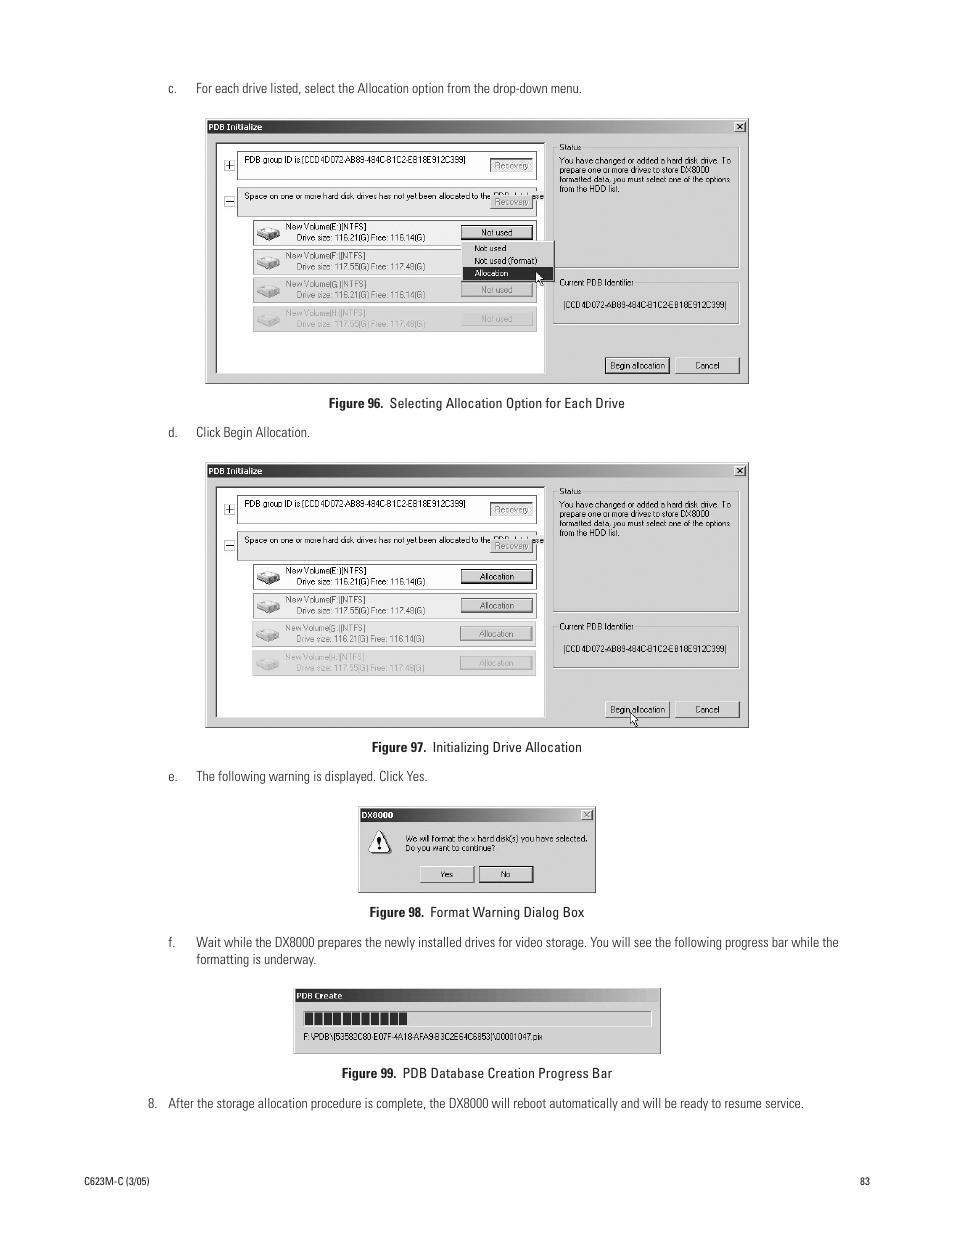 Dvr pelco dx8000 dx8up-512mbram user's manuals in pdf.